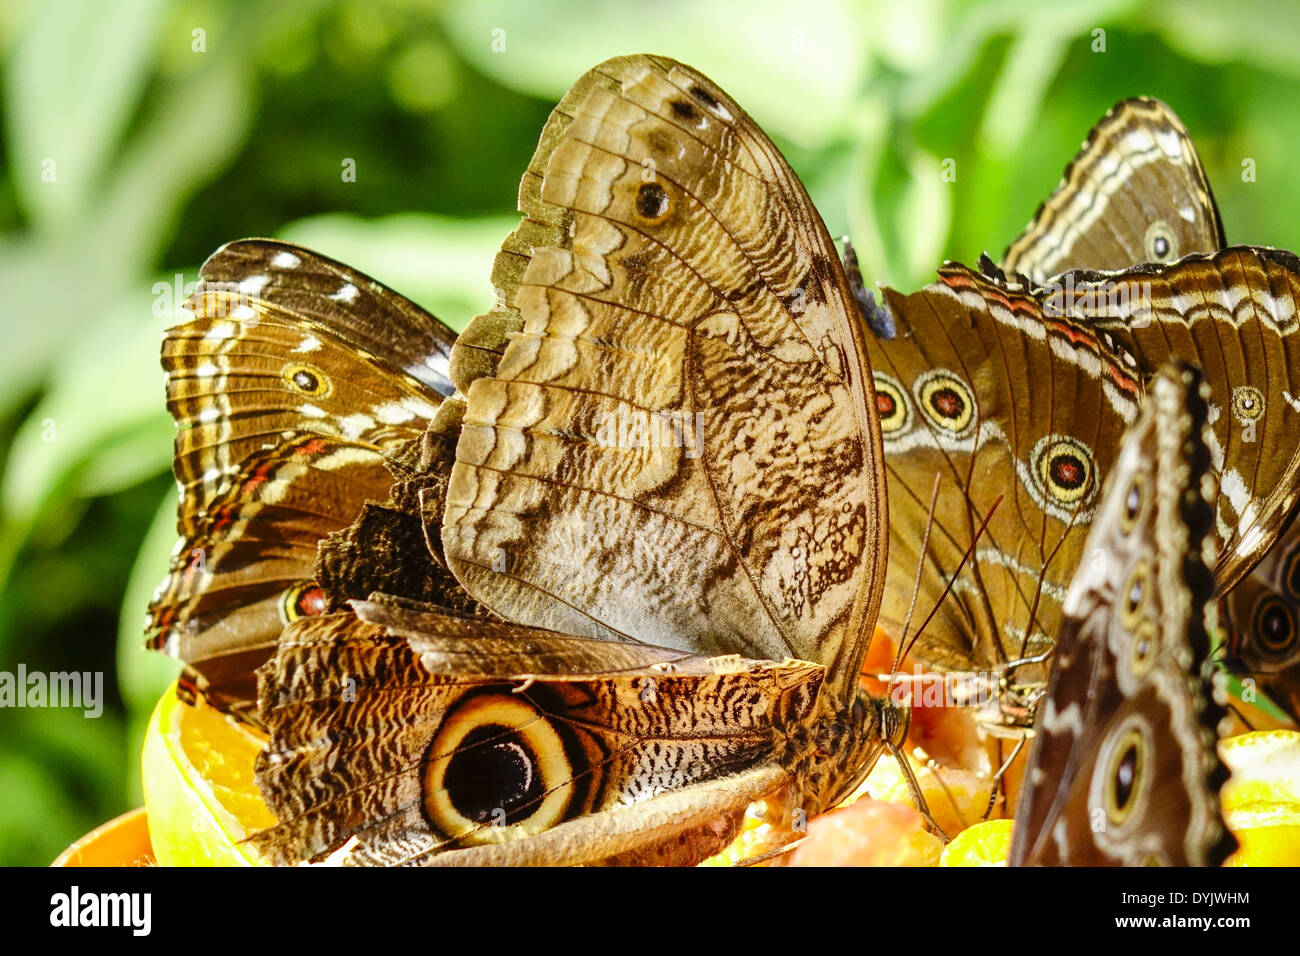 Tropische Schmetterlinge, Botanischer Garten München - Stock Image